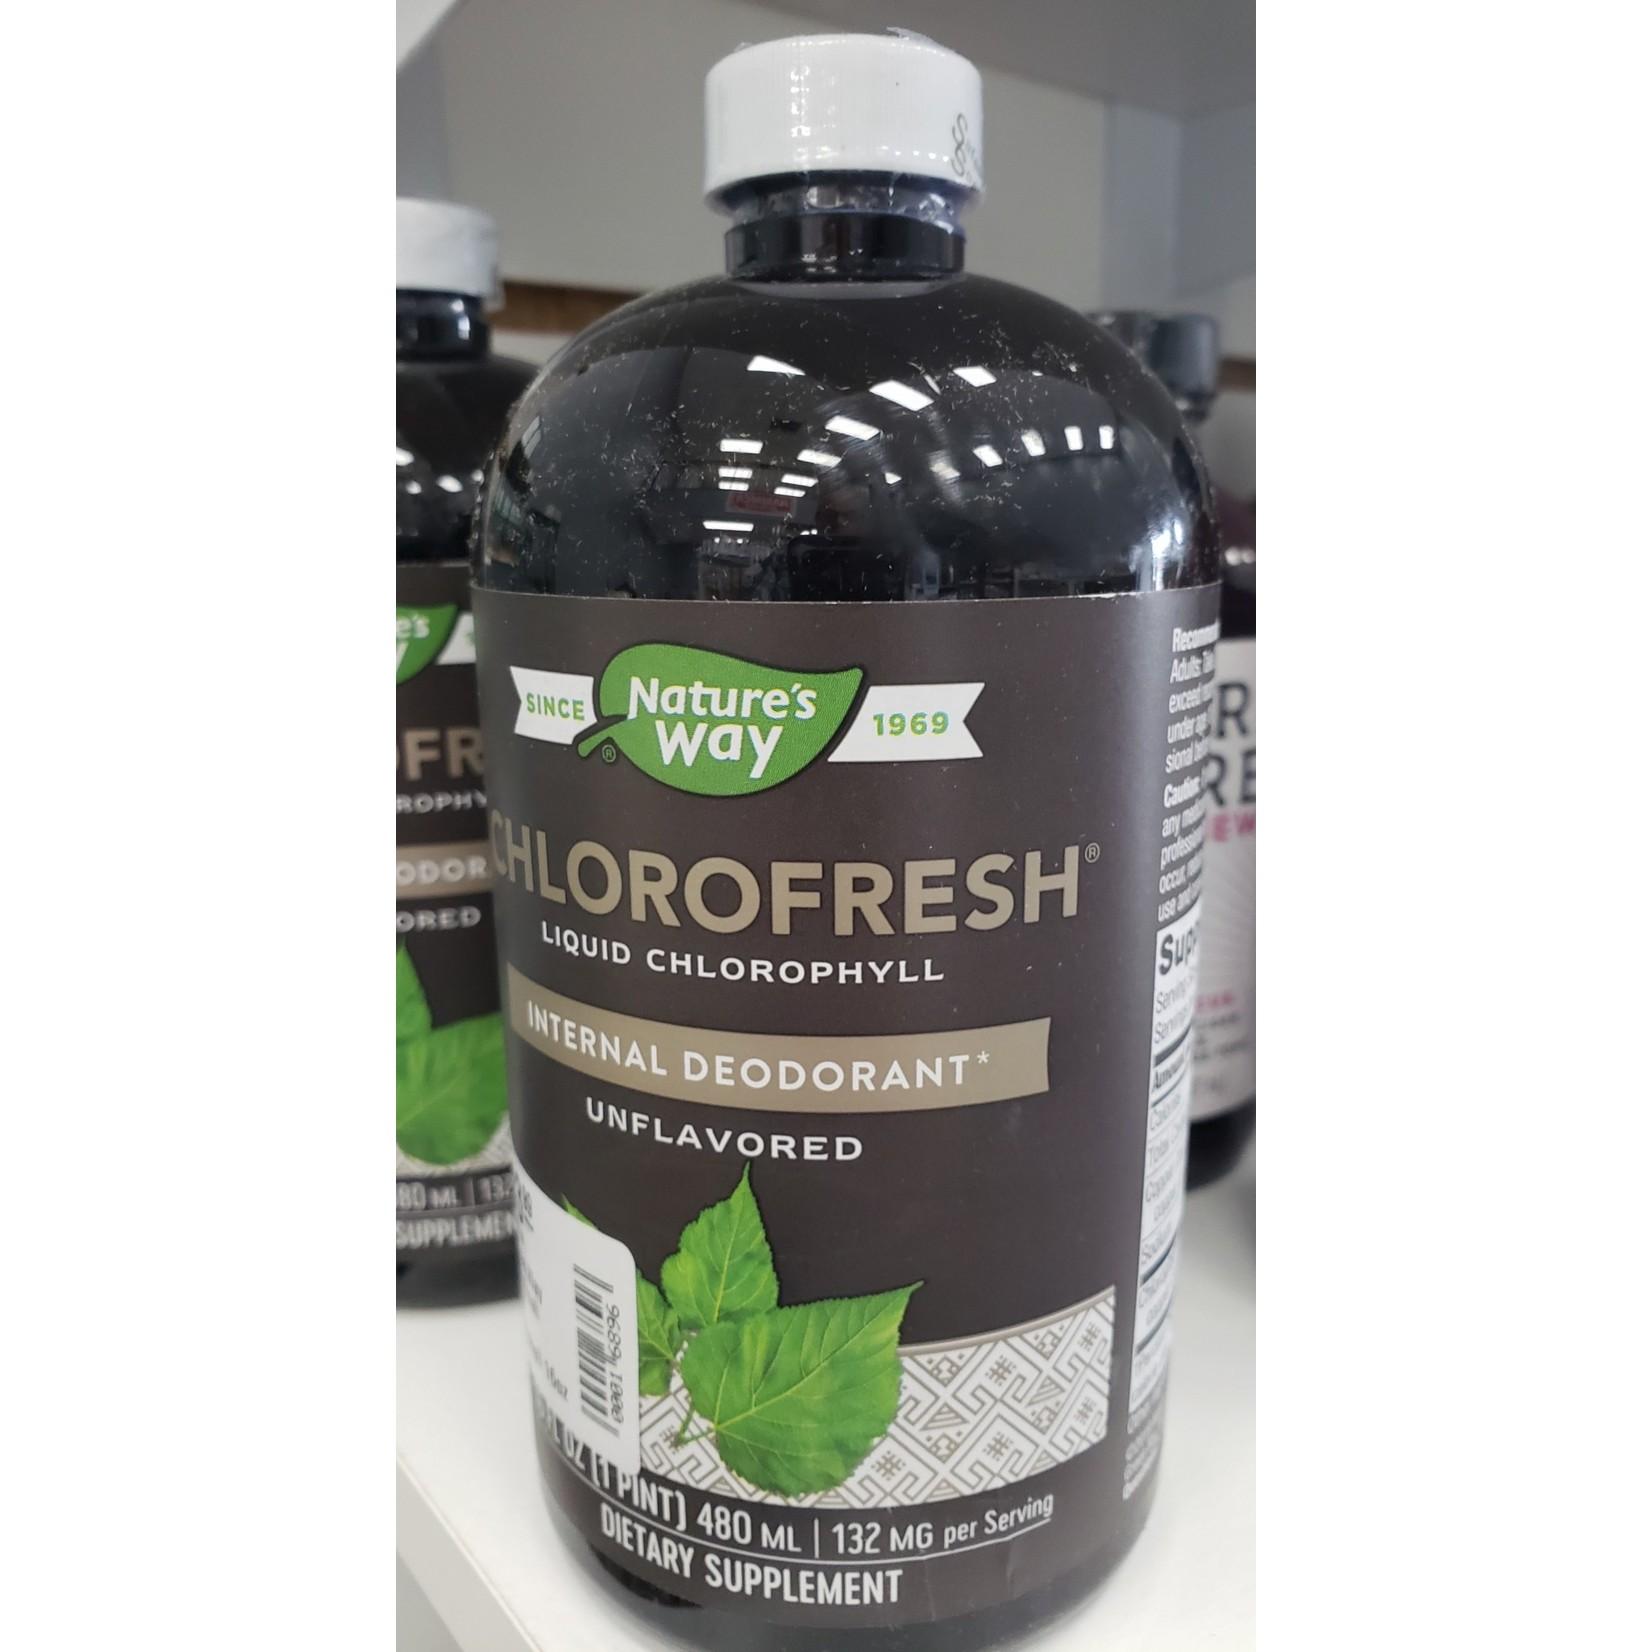 Natures Way Natures Way Chlorofresh Liquid Chlorophyll 16oz